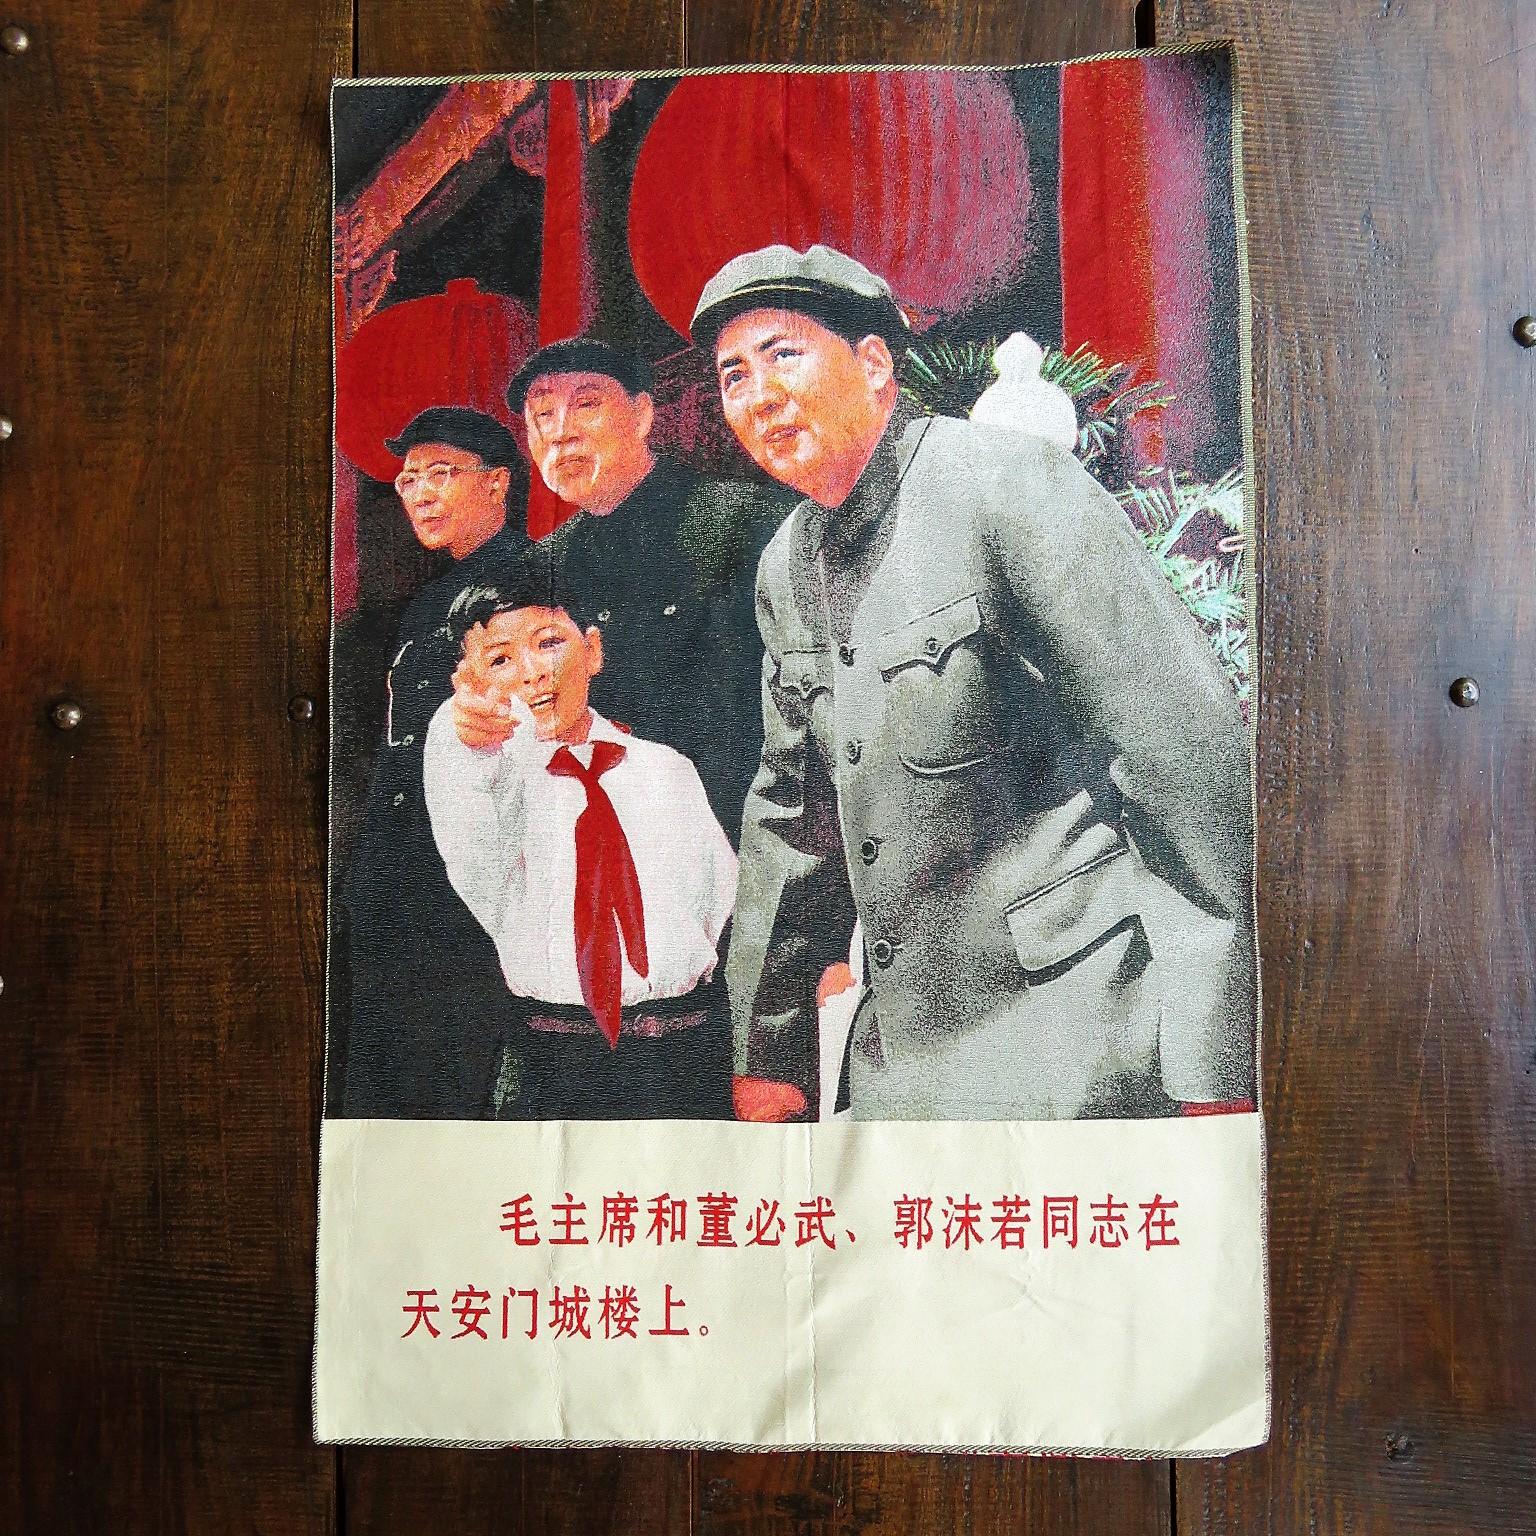 cloth-mao-zedong-1